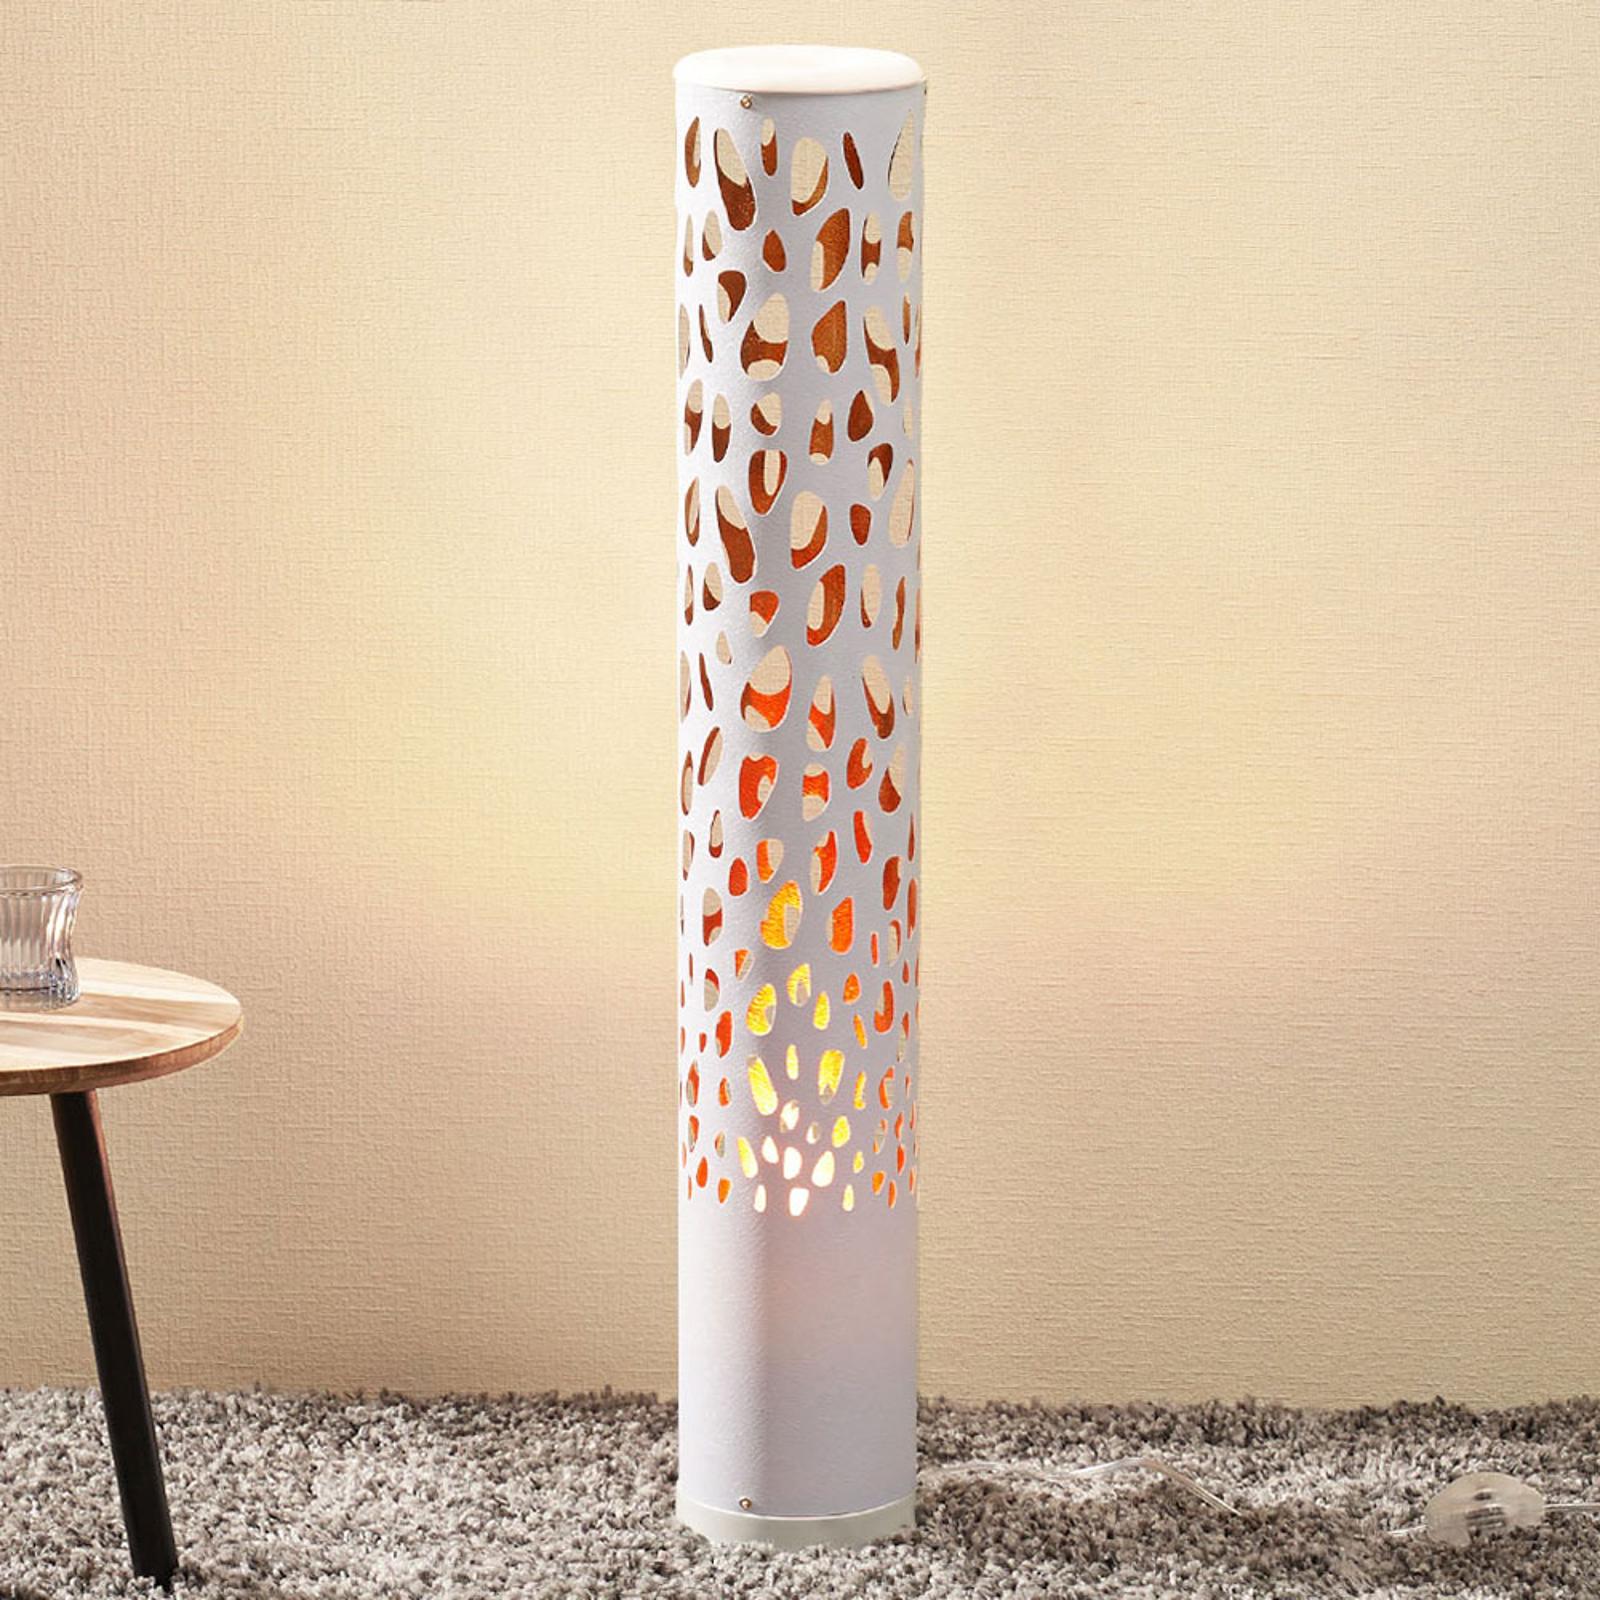 Witte LED vloerlamp Organic met vlamlamp